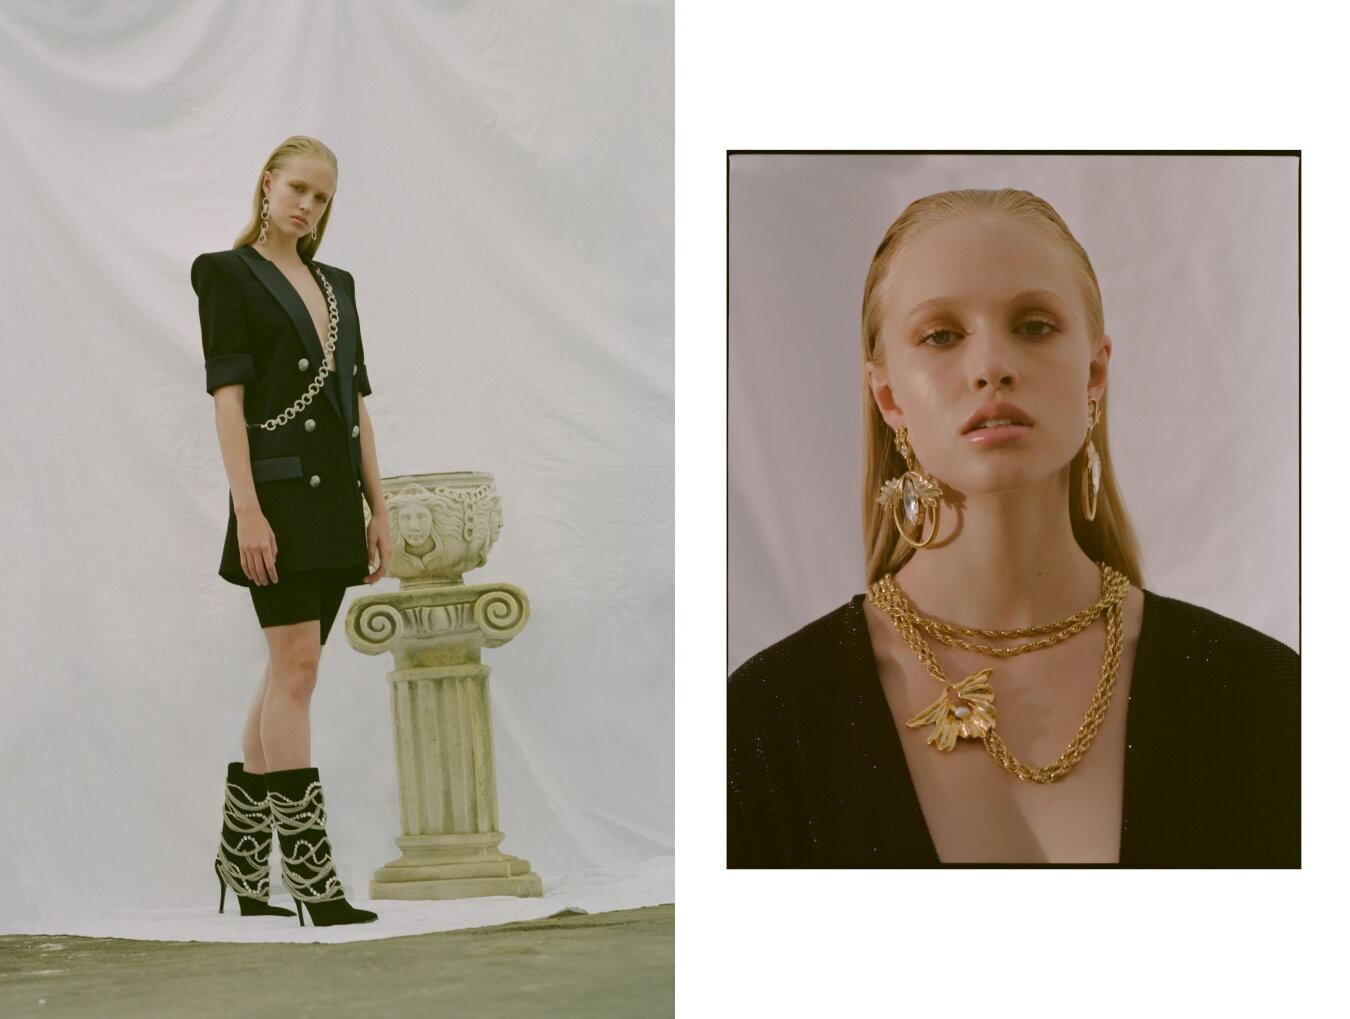 Left: Balmain Blazer Dress, Guiseppe Zanotti Boots, Balyck Earrings & Harness // Right: Alexandre Vauthier Dress, Balyck Earrings & Necklace